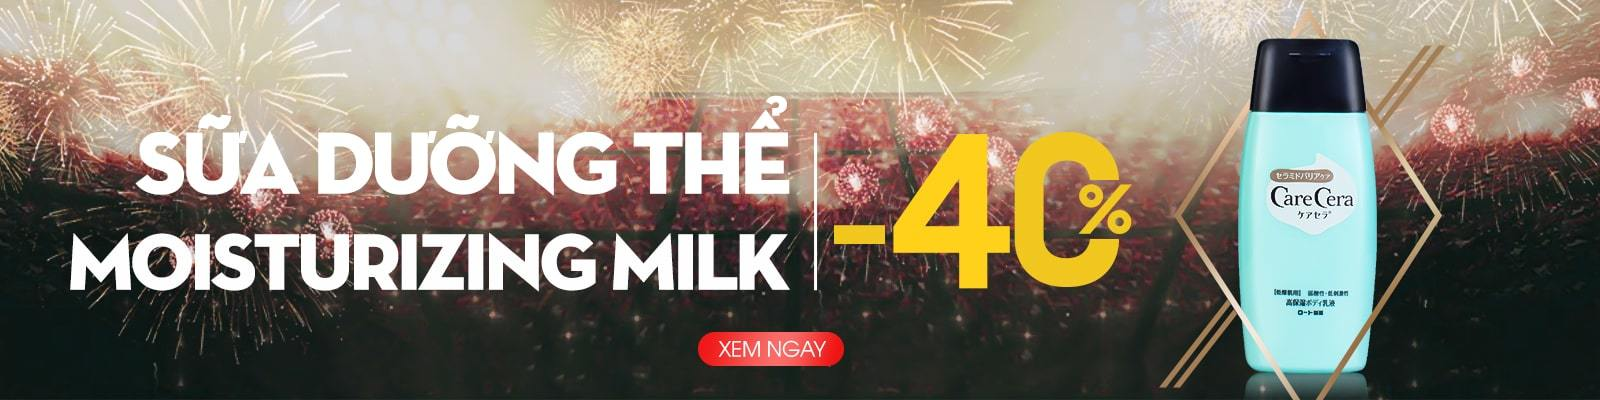 Sữa dưỡng thể dưỡng ẩm Care Cera Moisturizing Milk